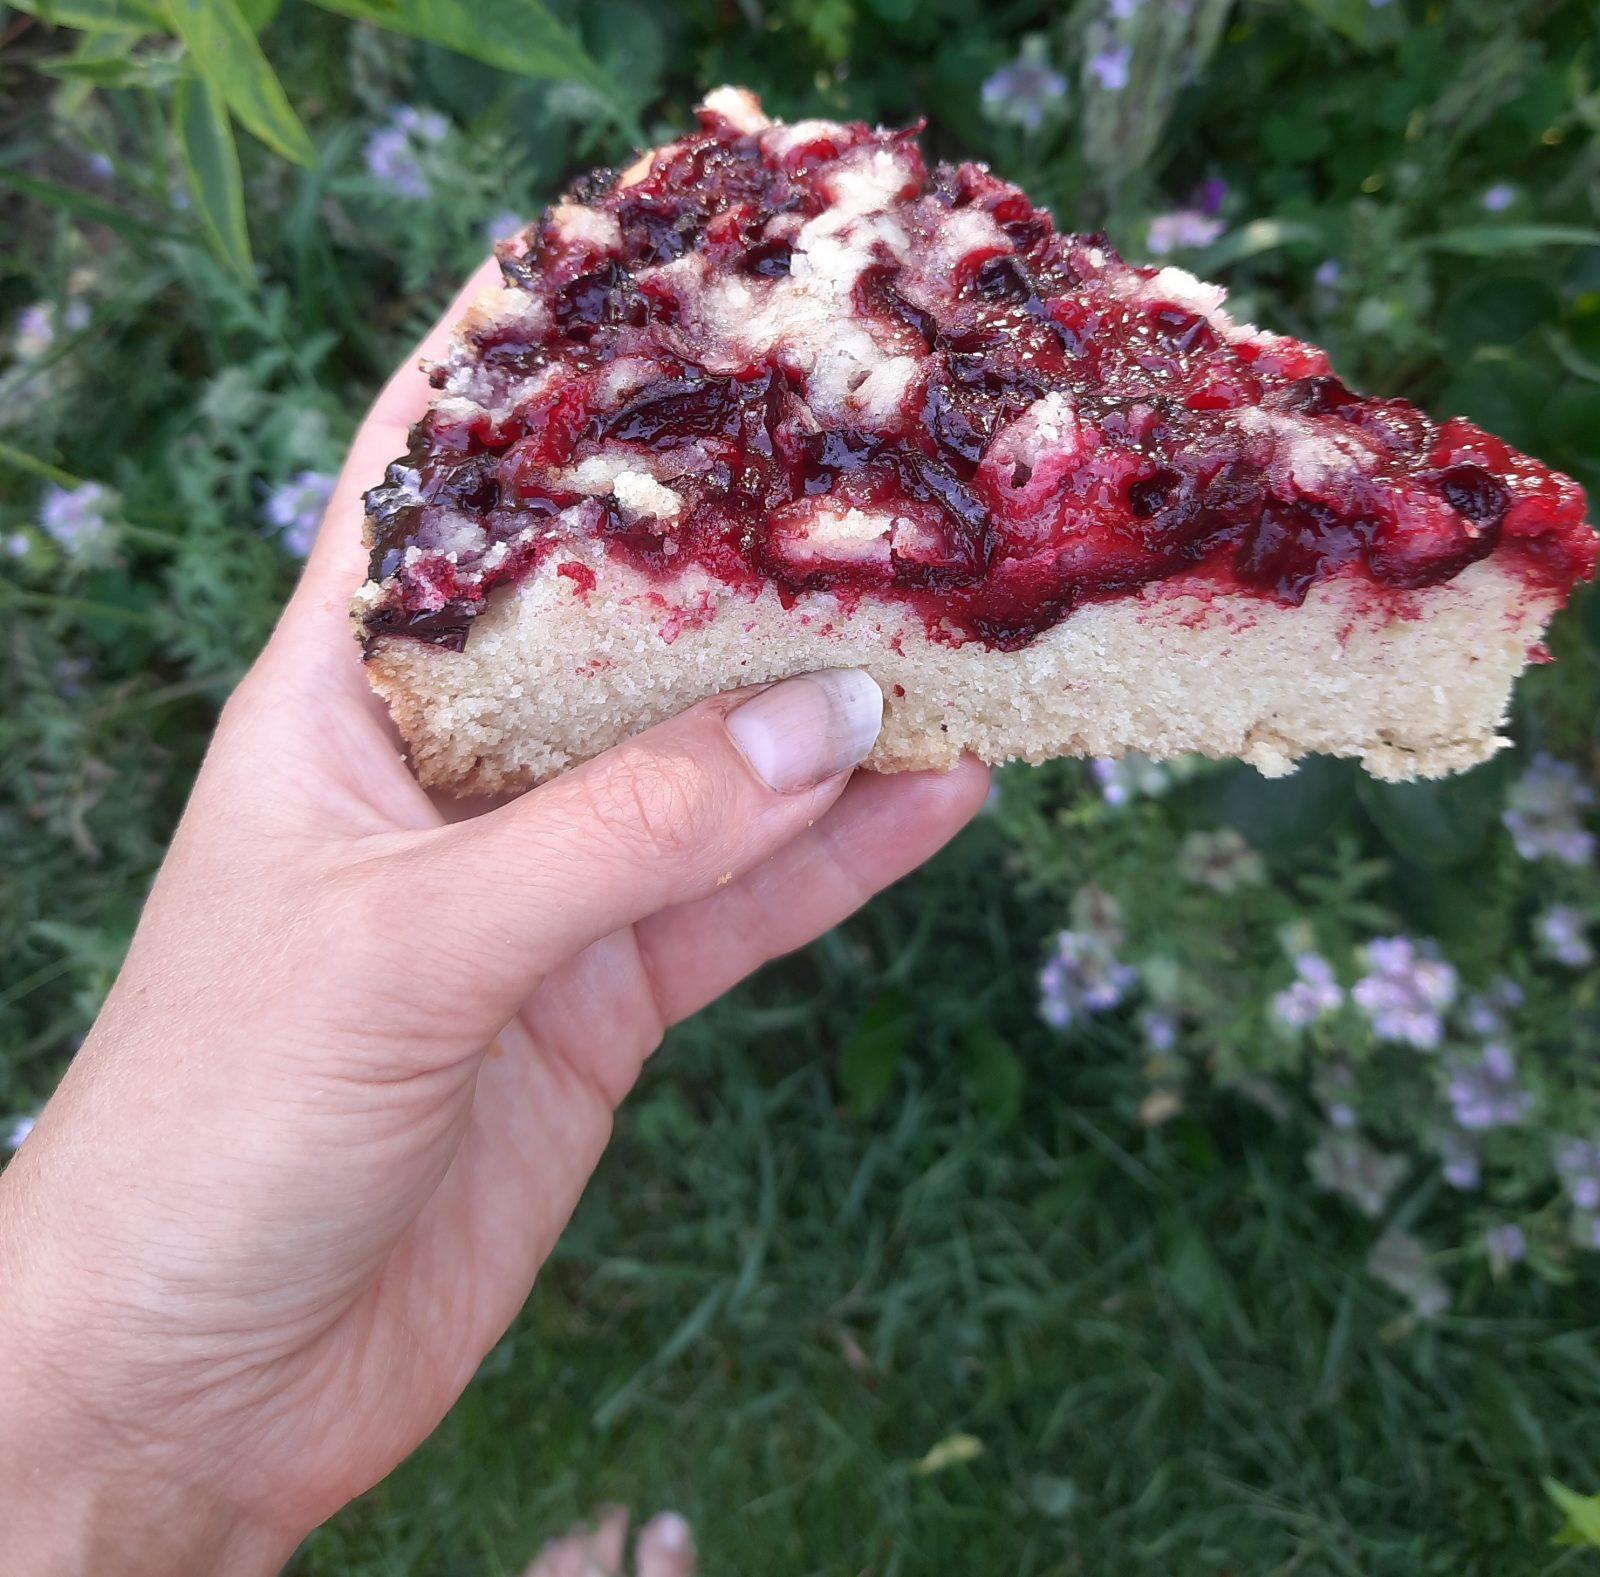 Myrobalánový koláč